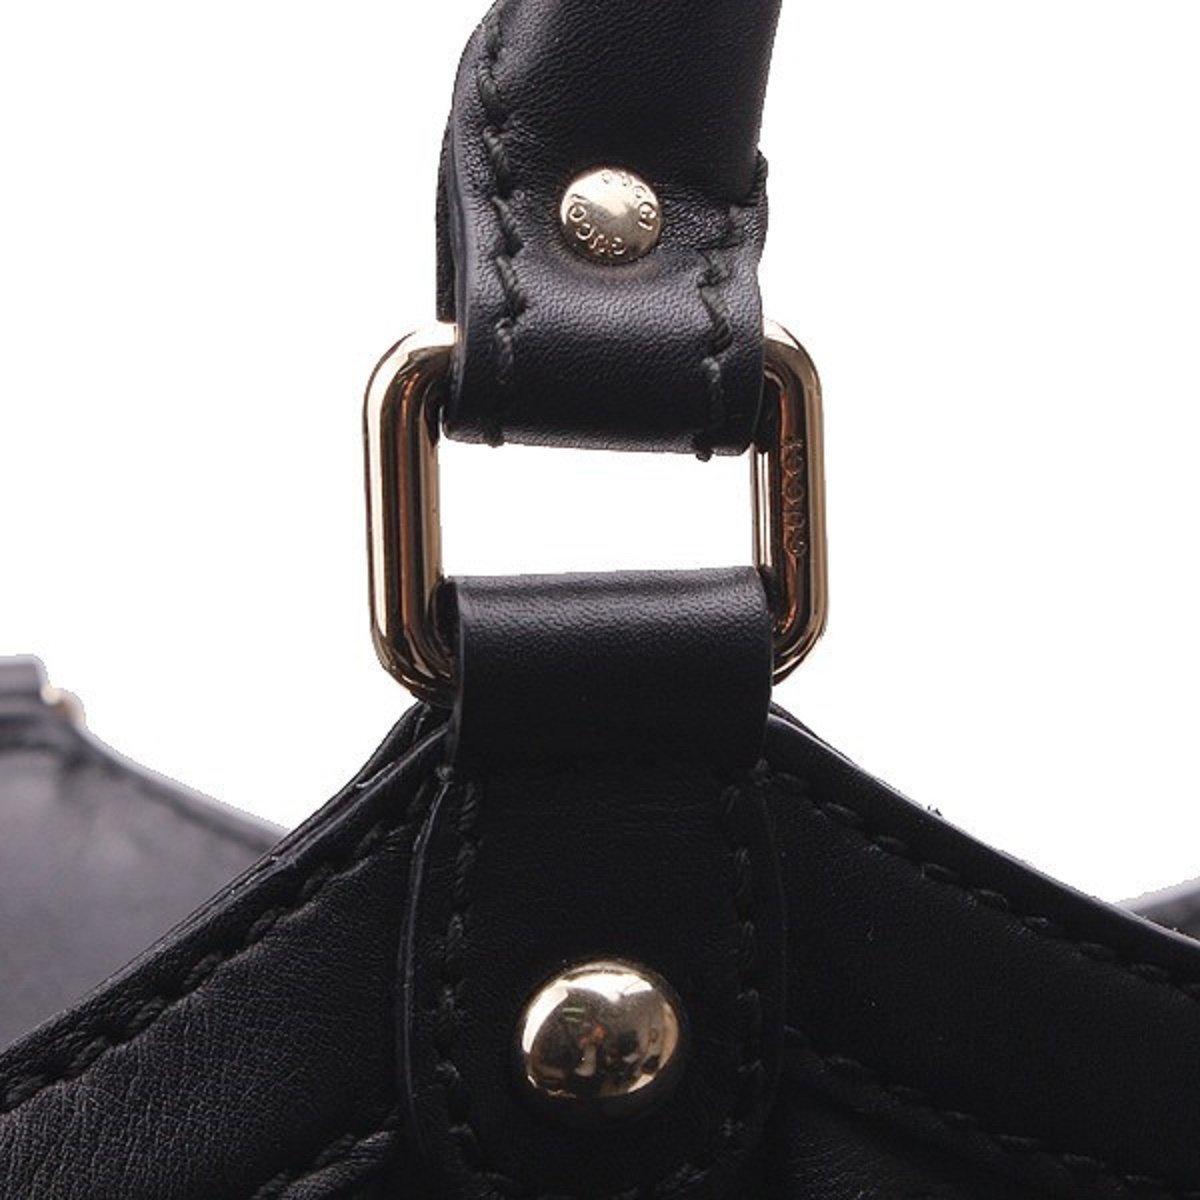 af2ee2f7fd2a Amazon.com: Gucci Sukey Guccissima Black Leather Large Tote Bag Handbag:  Shoes